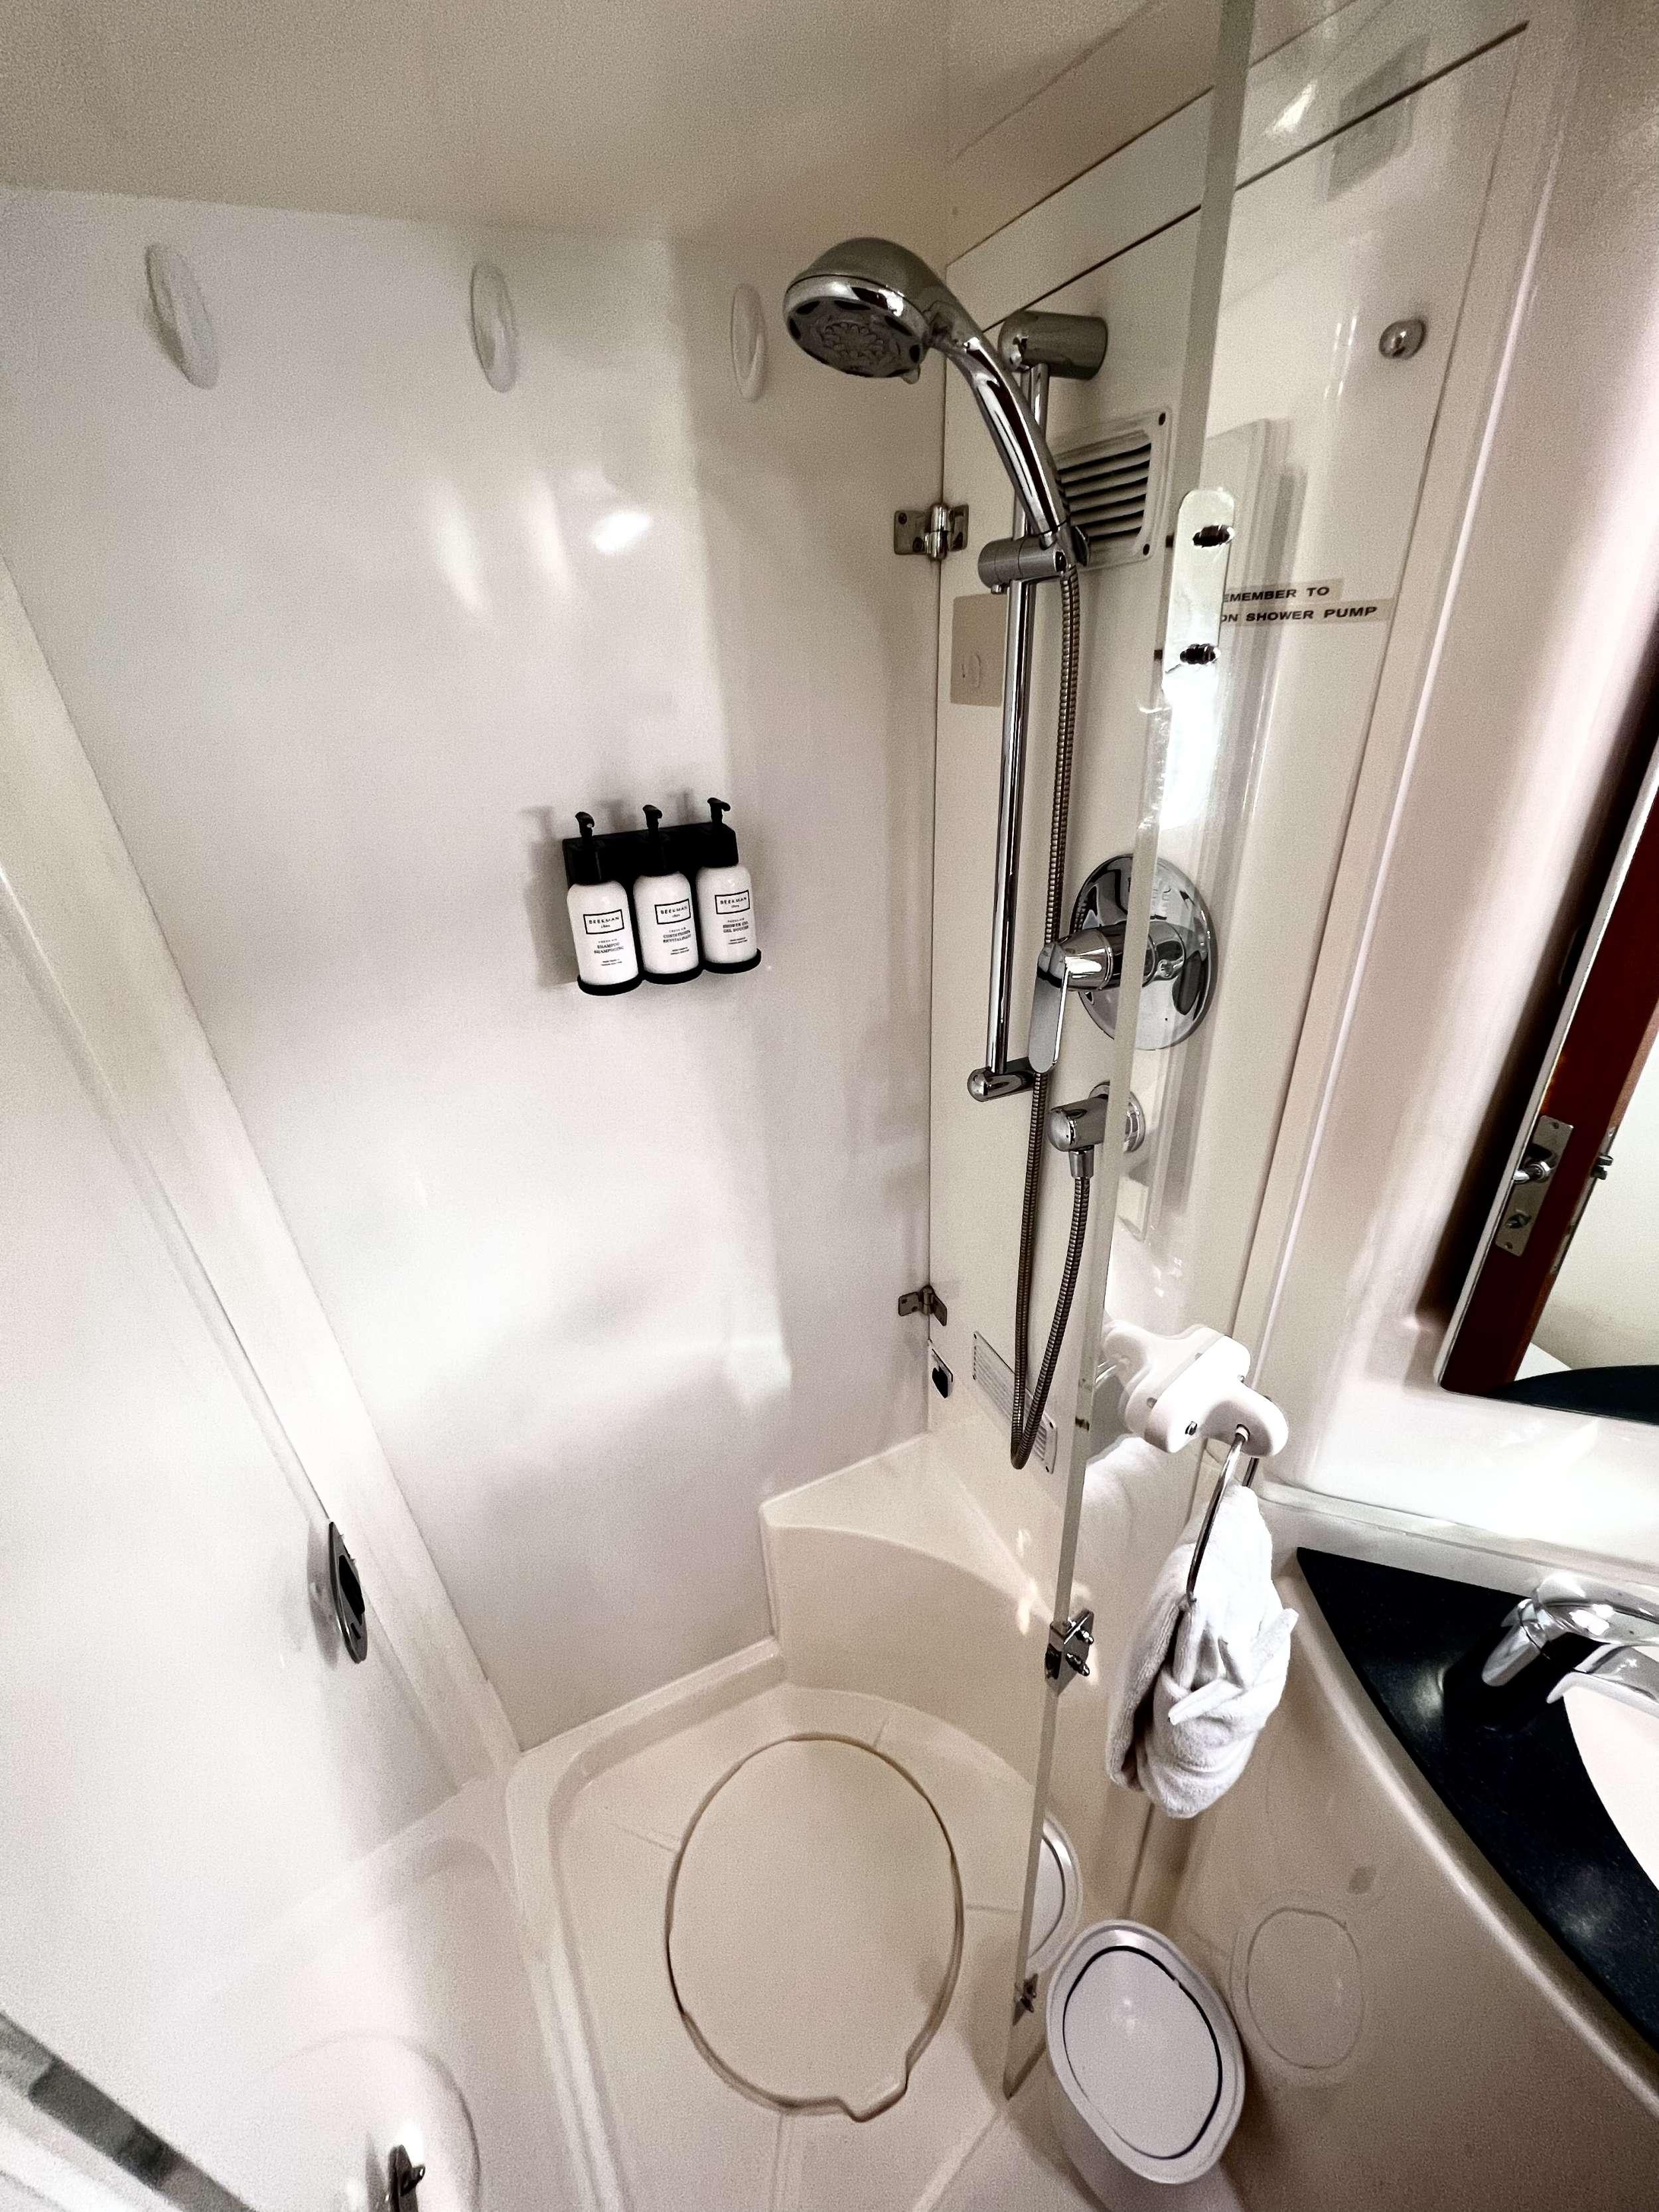 Separate shower stalls in each bathroom.